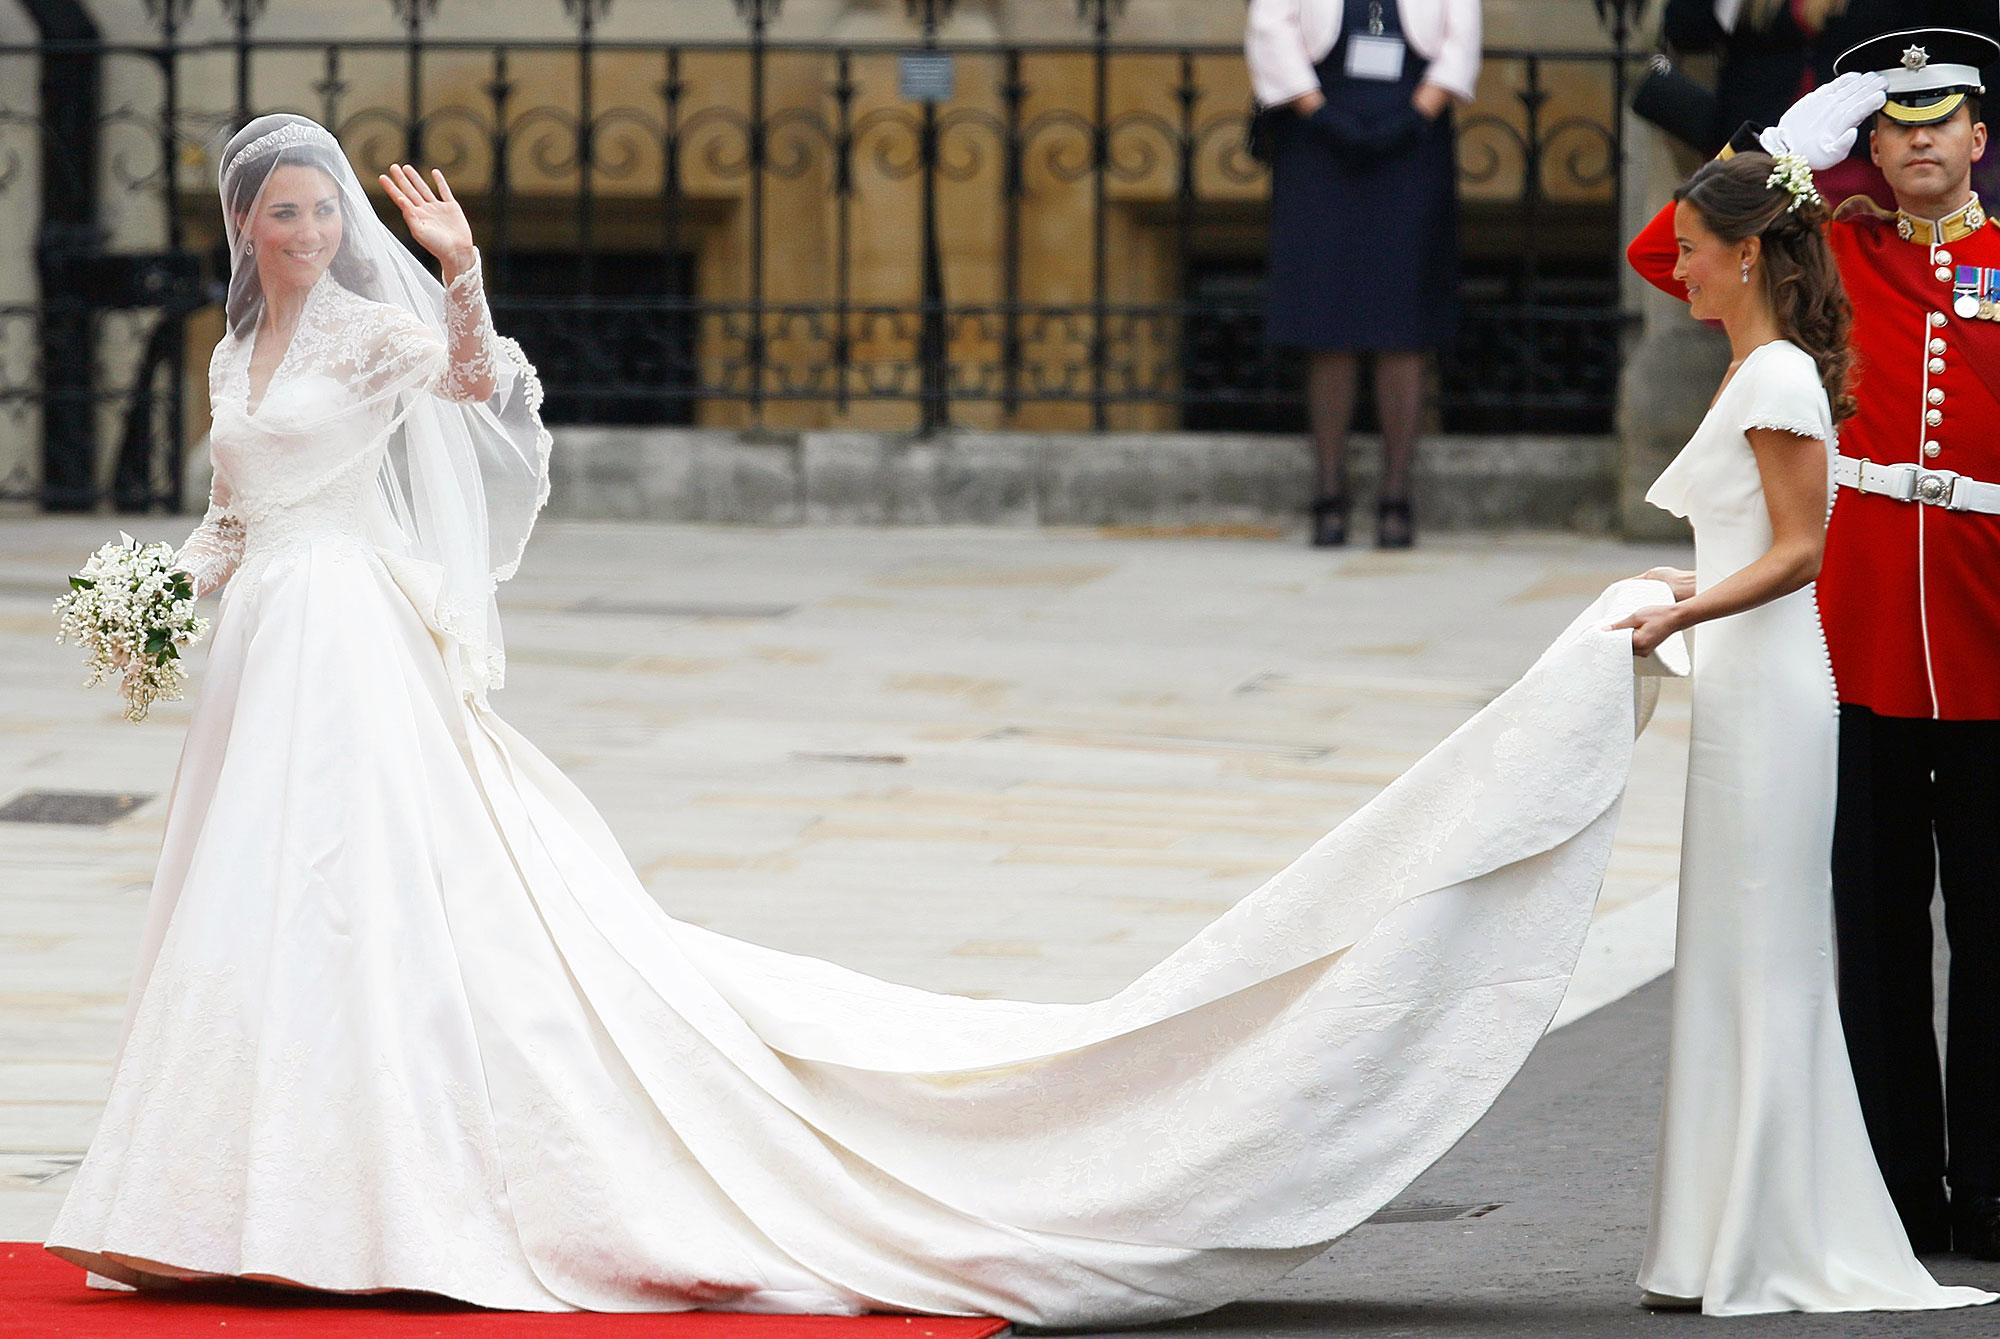 Pippa Middleton Holding Kate Middleton Wedding Train and Kate Waving to Crowd